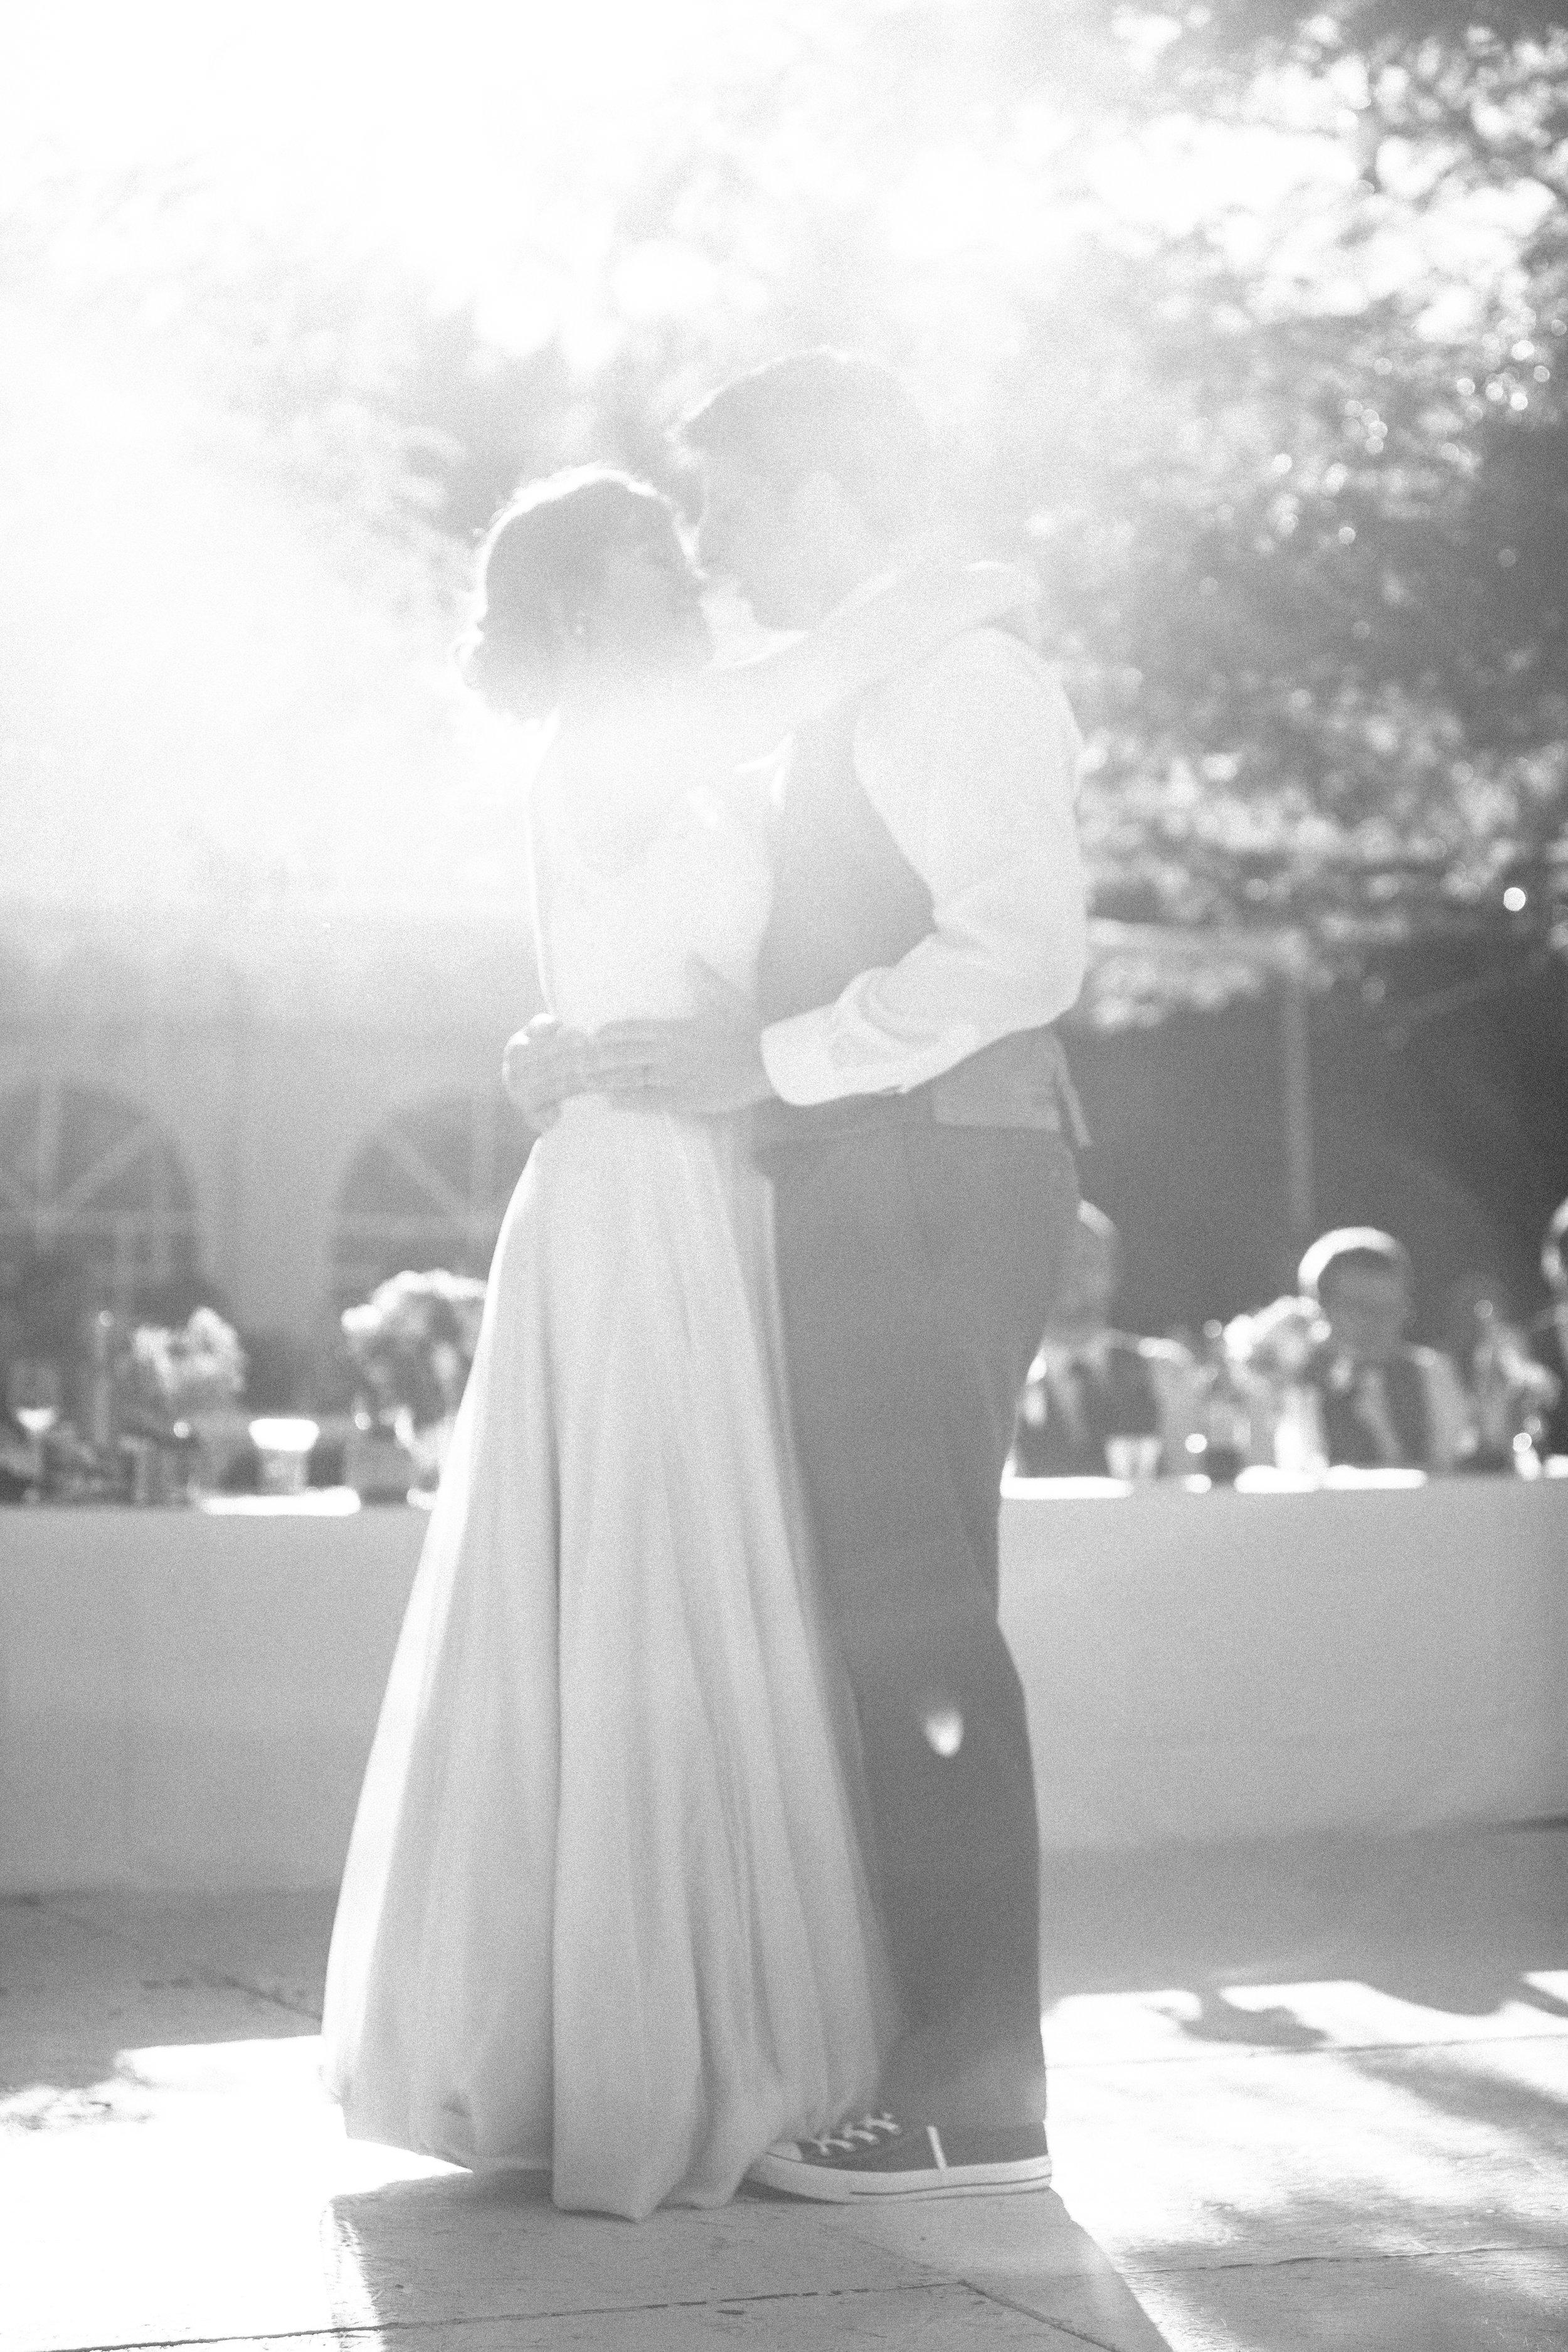 Jordan & Shantel Married - Idaho - Corrie Mick Photography-298.jpg